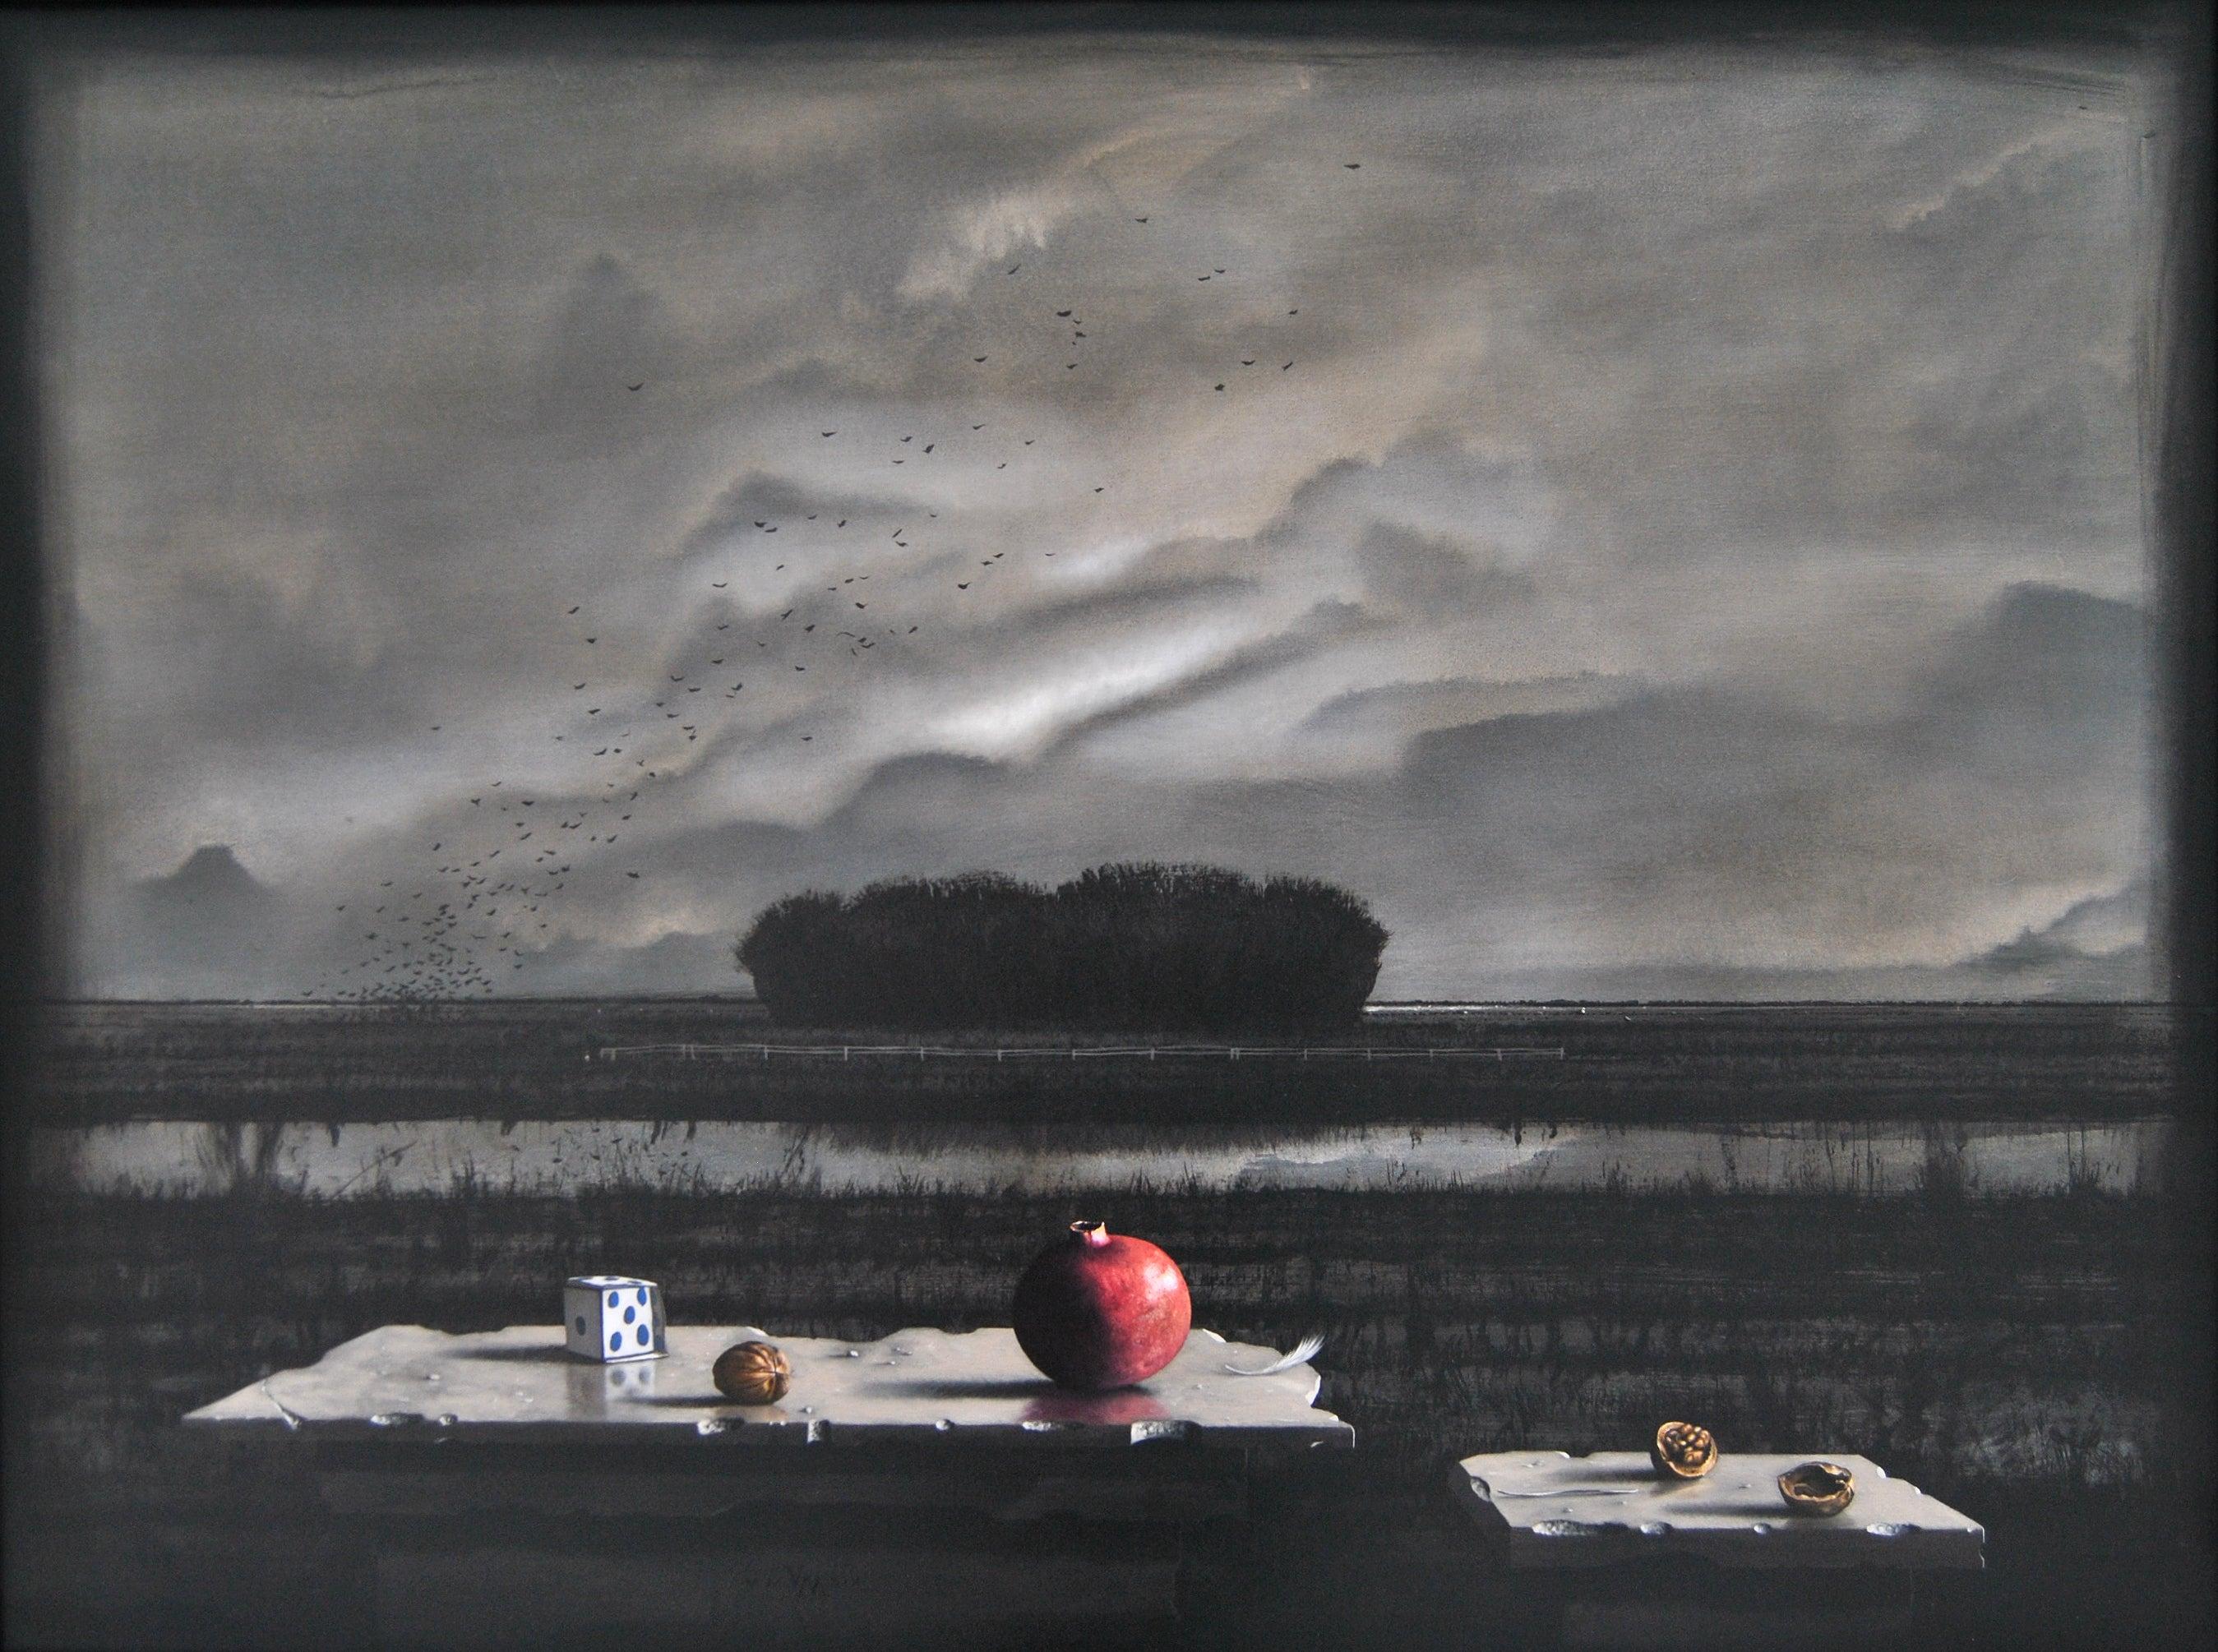 Souvenir D'une Restriction - Victor Muller, 21st Century Contemporary Painting